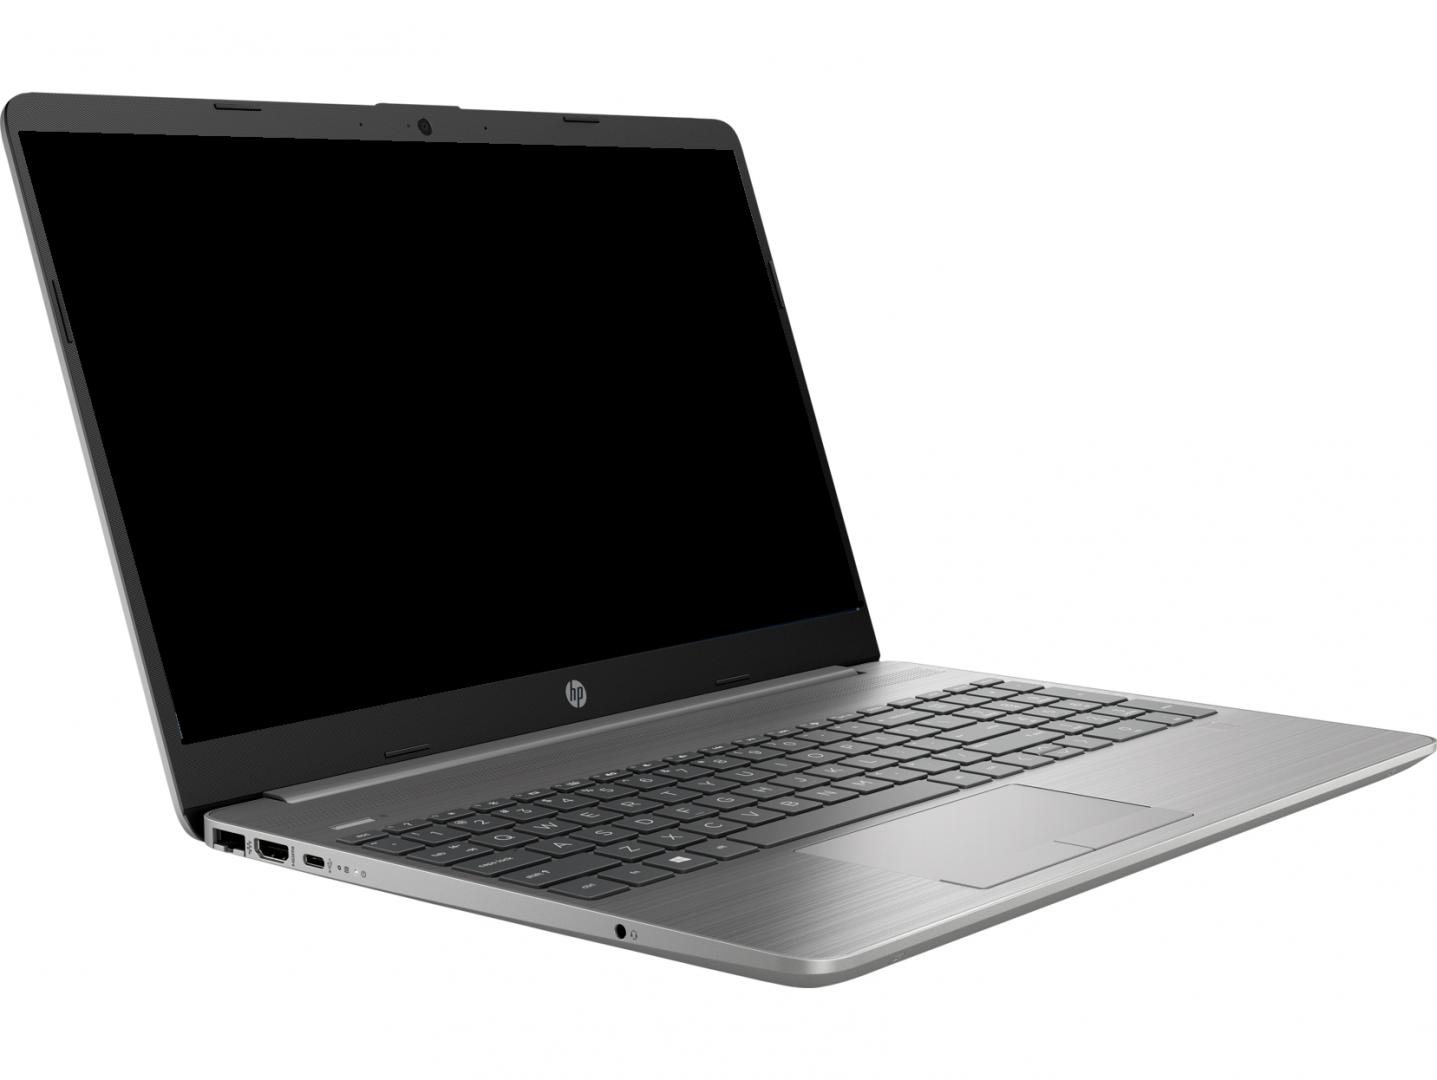 "NOTEBOOK HP 250G8 15.6"" FHD i3-1005G1 8GB 512GB 2GB-MX130 DOS - imaginea 2"